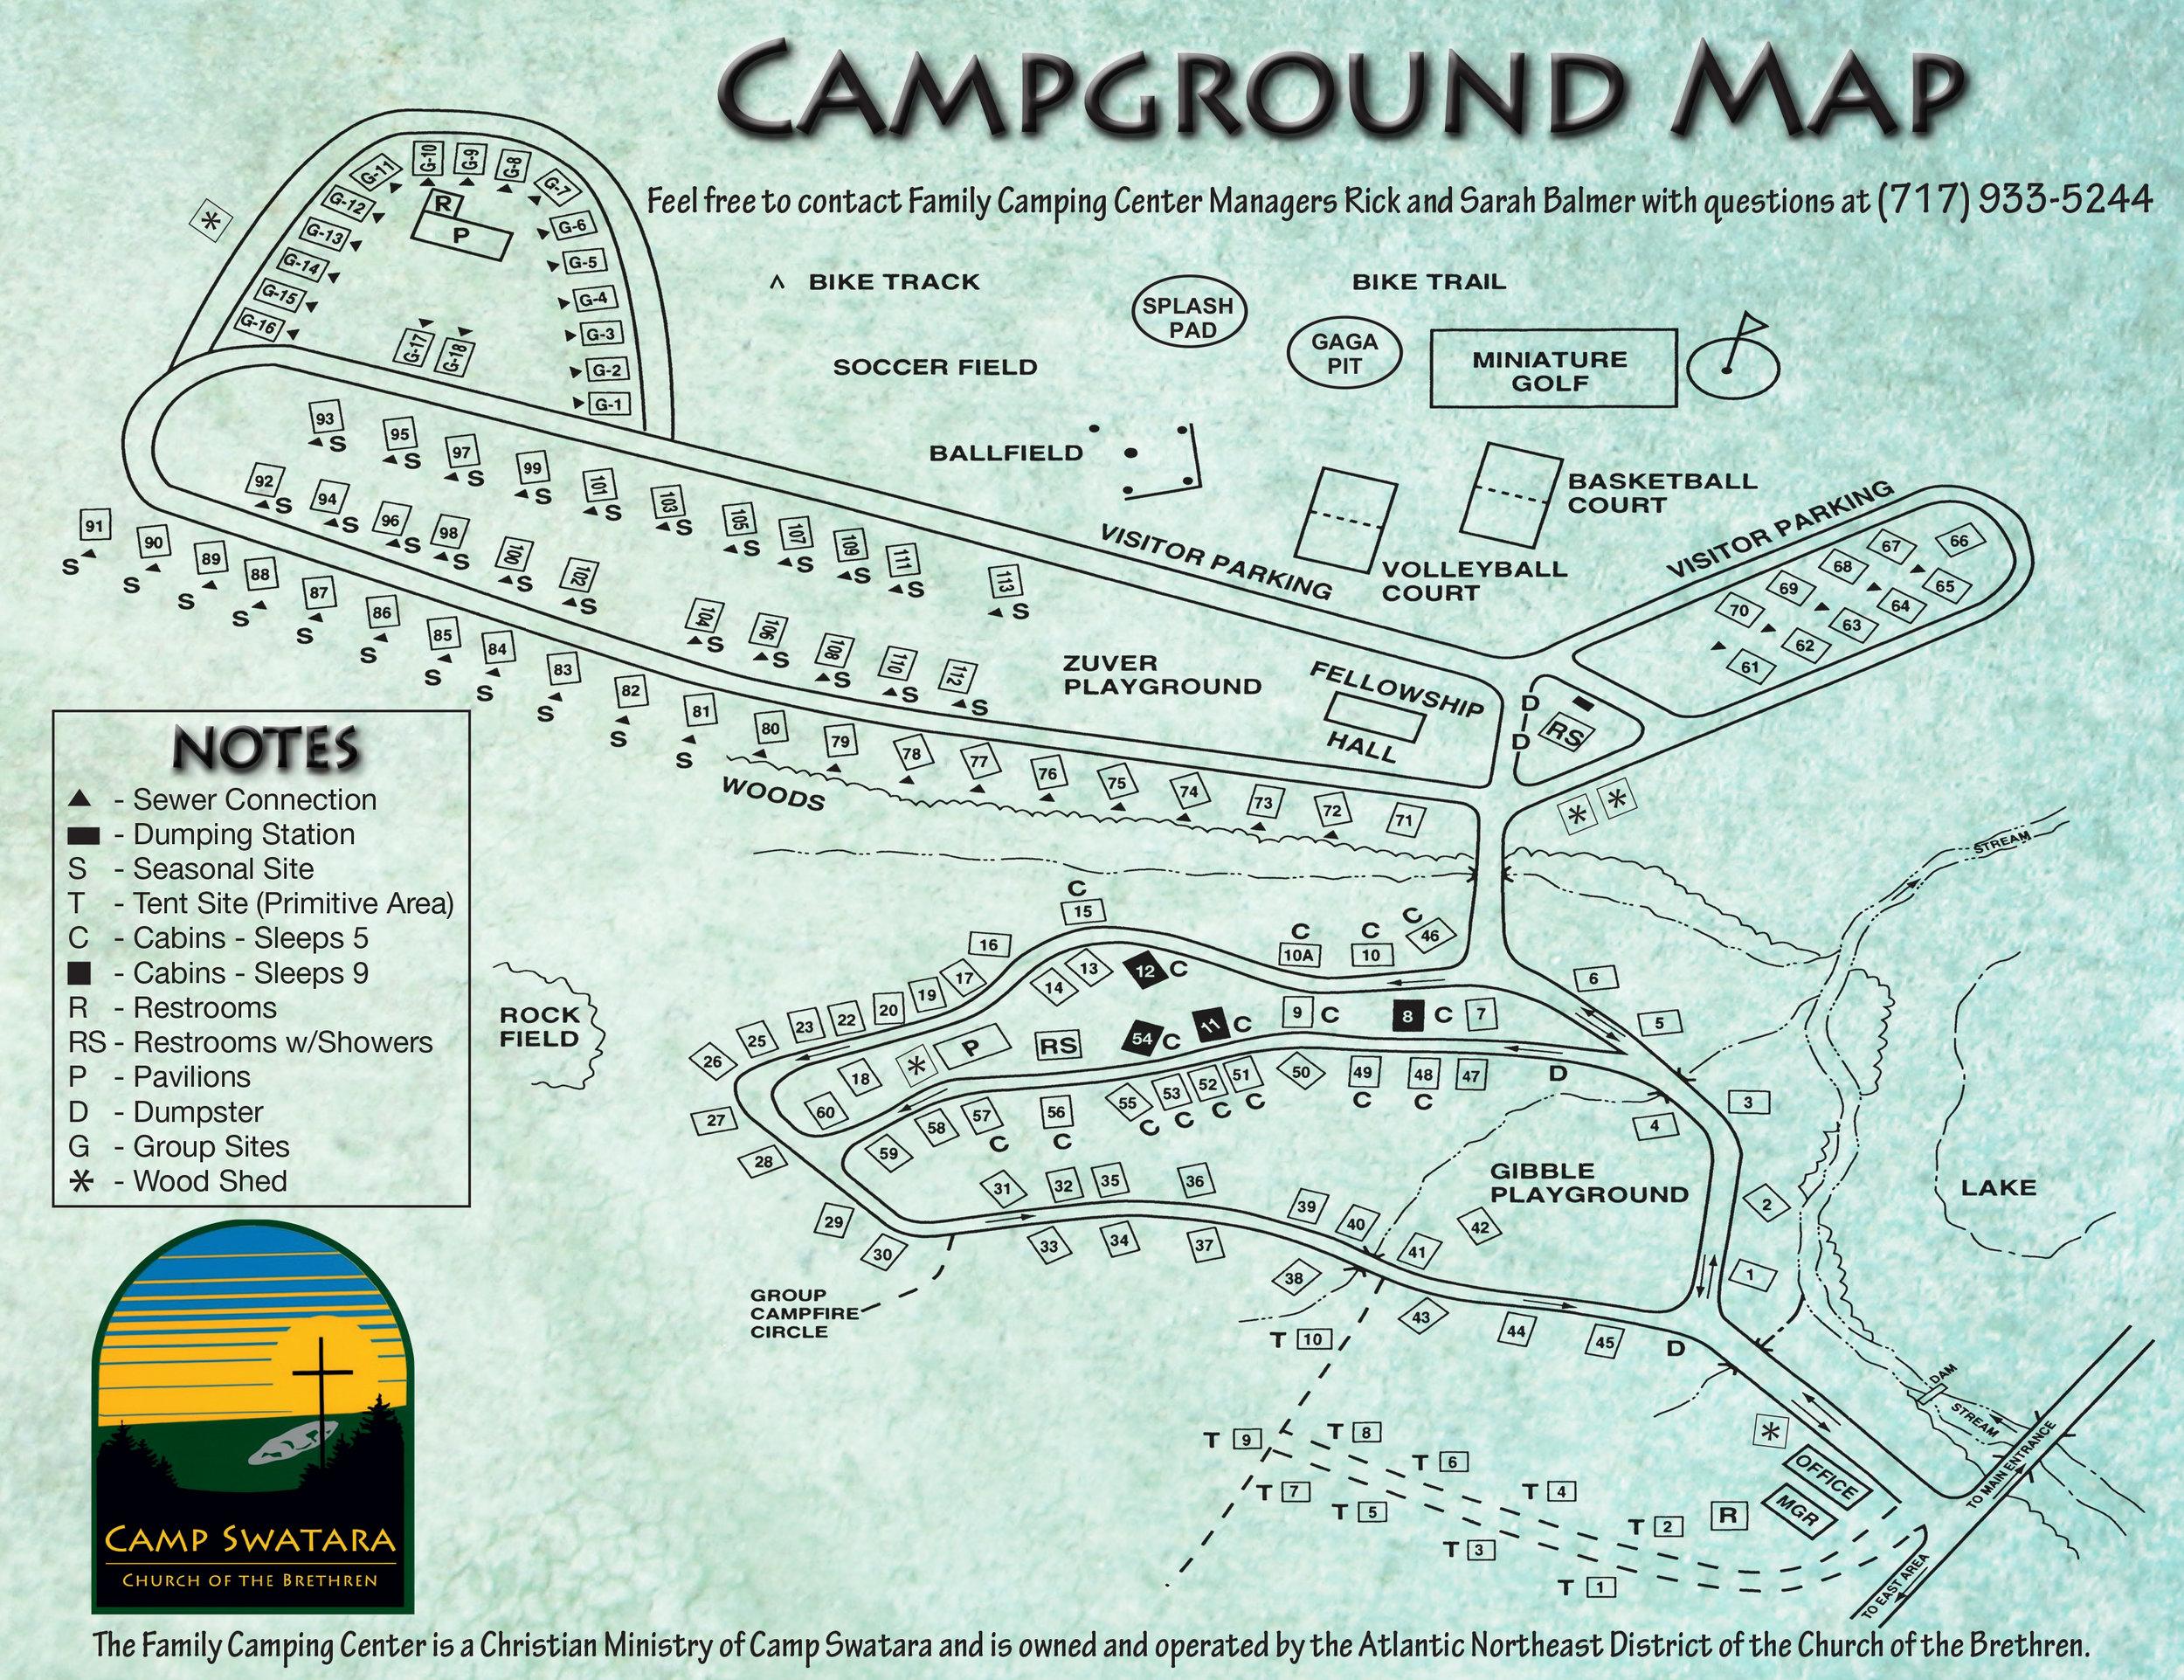 Camp Swatara Map_Final proof.jpg